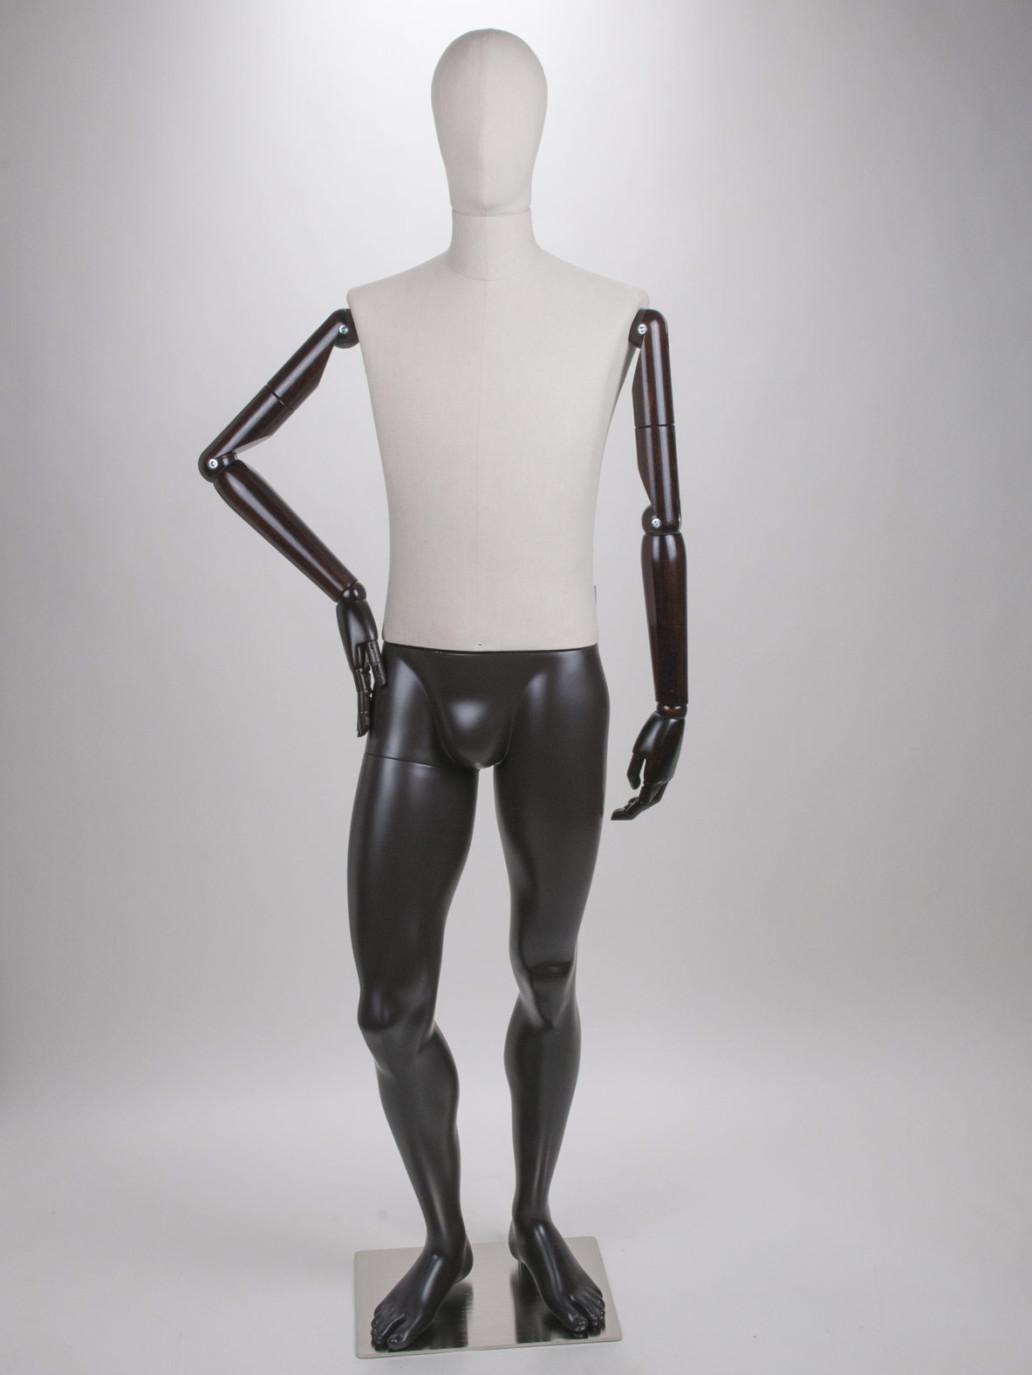 Wonderbaarlijk Mannequins - Paspoppen Vintage | Tailor's N.Y. België OM-39